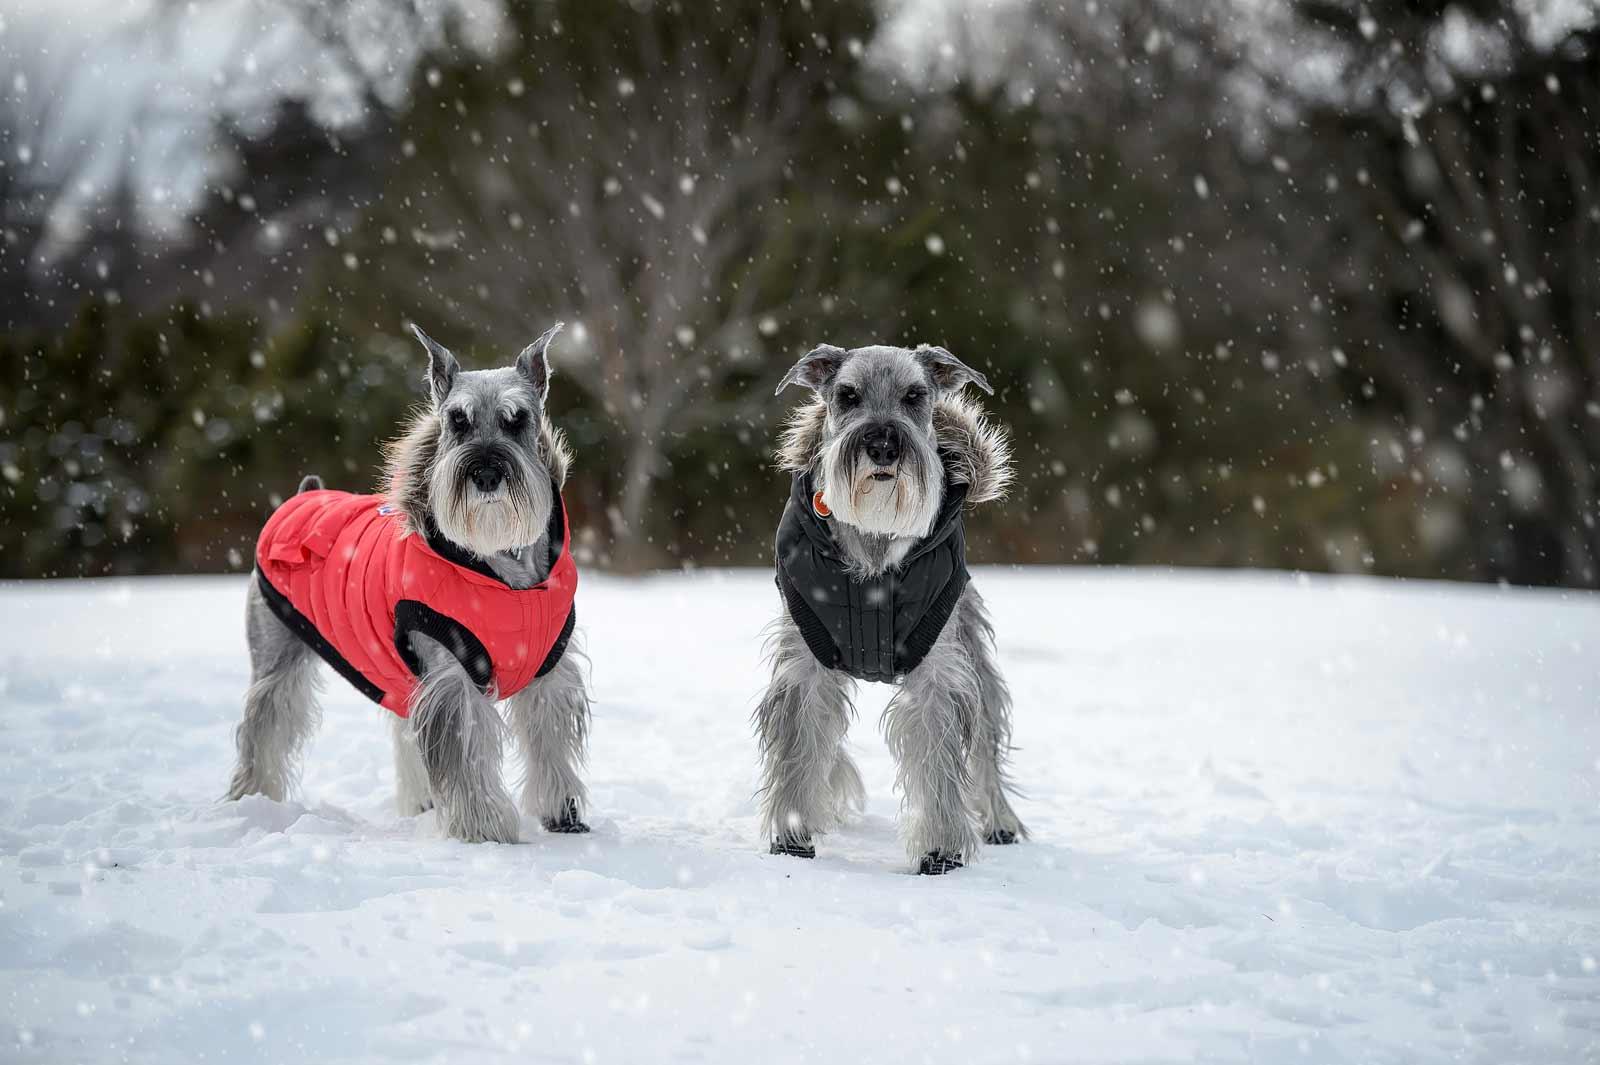 HugoCleo-Winter-011-snow